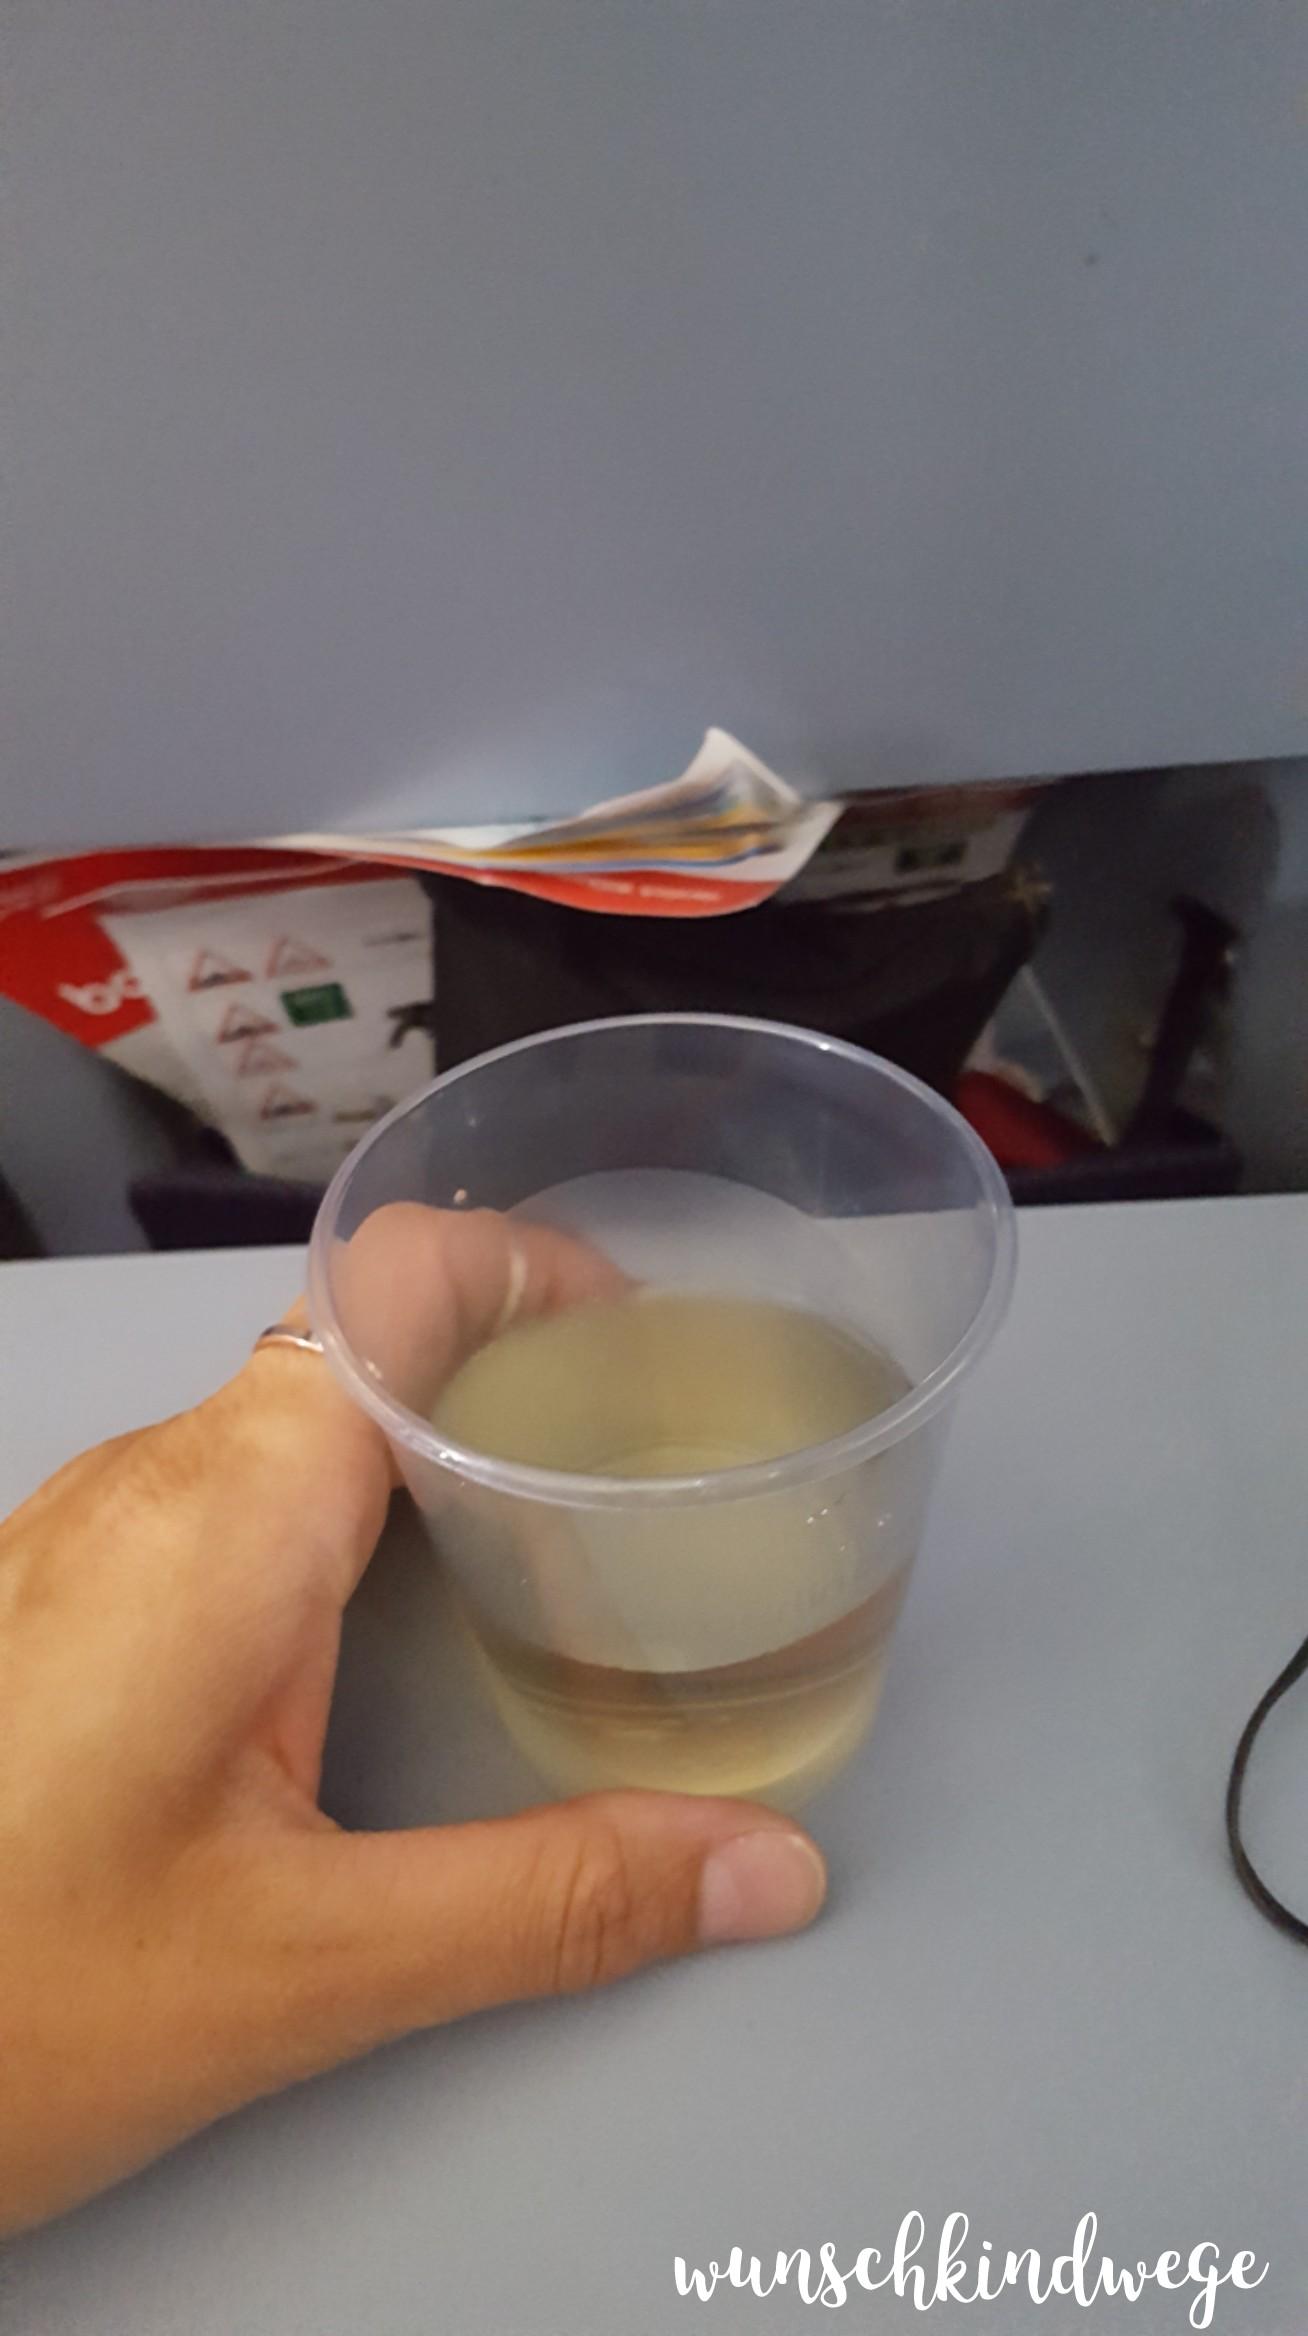 Flugzeug Becher Weißwein Florida Rückflug